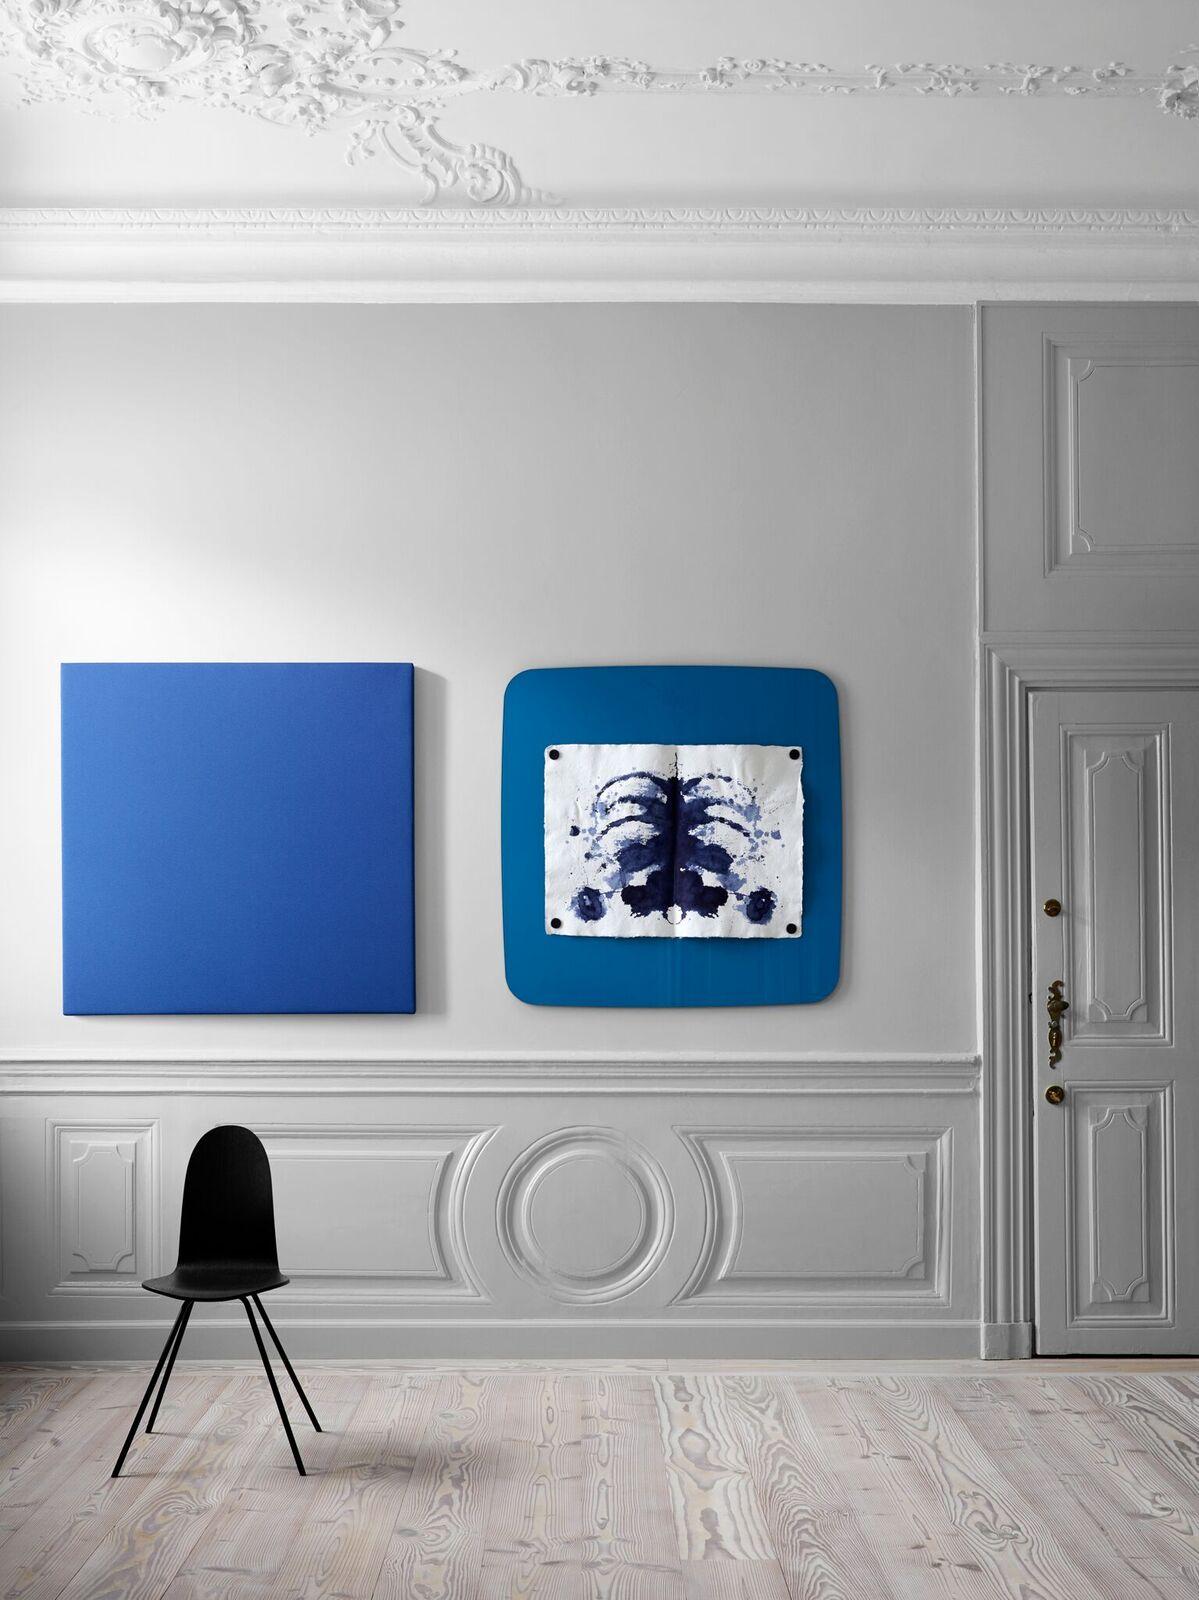 Flow Wall, Design Christian Halleröd, ©Lintex